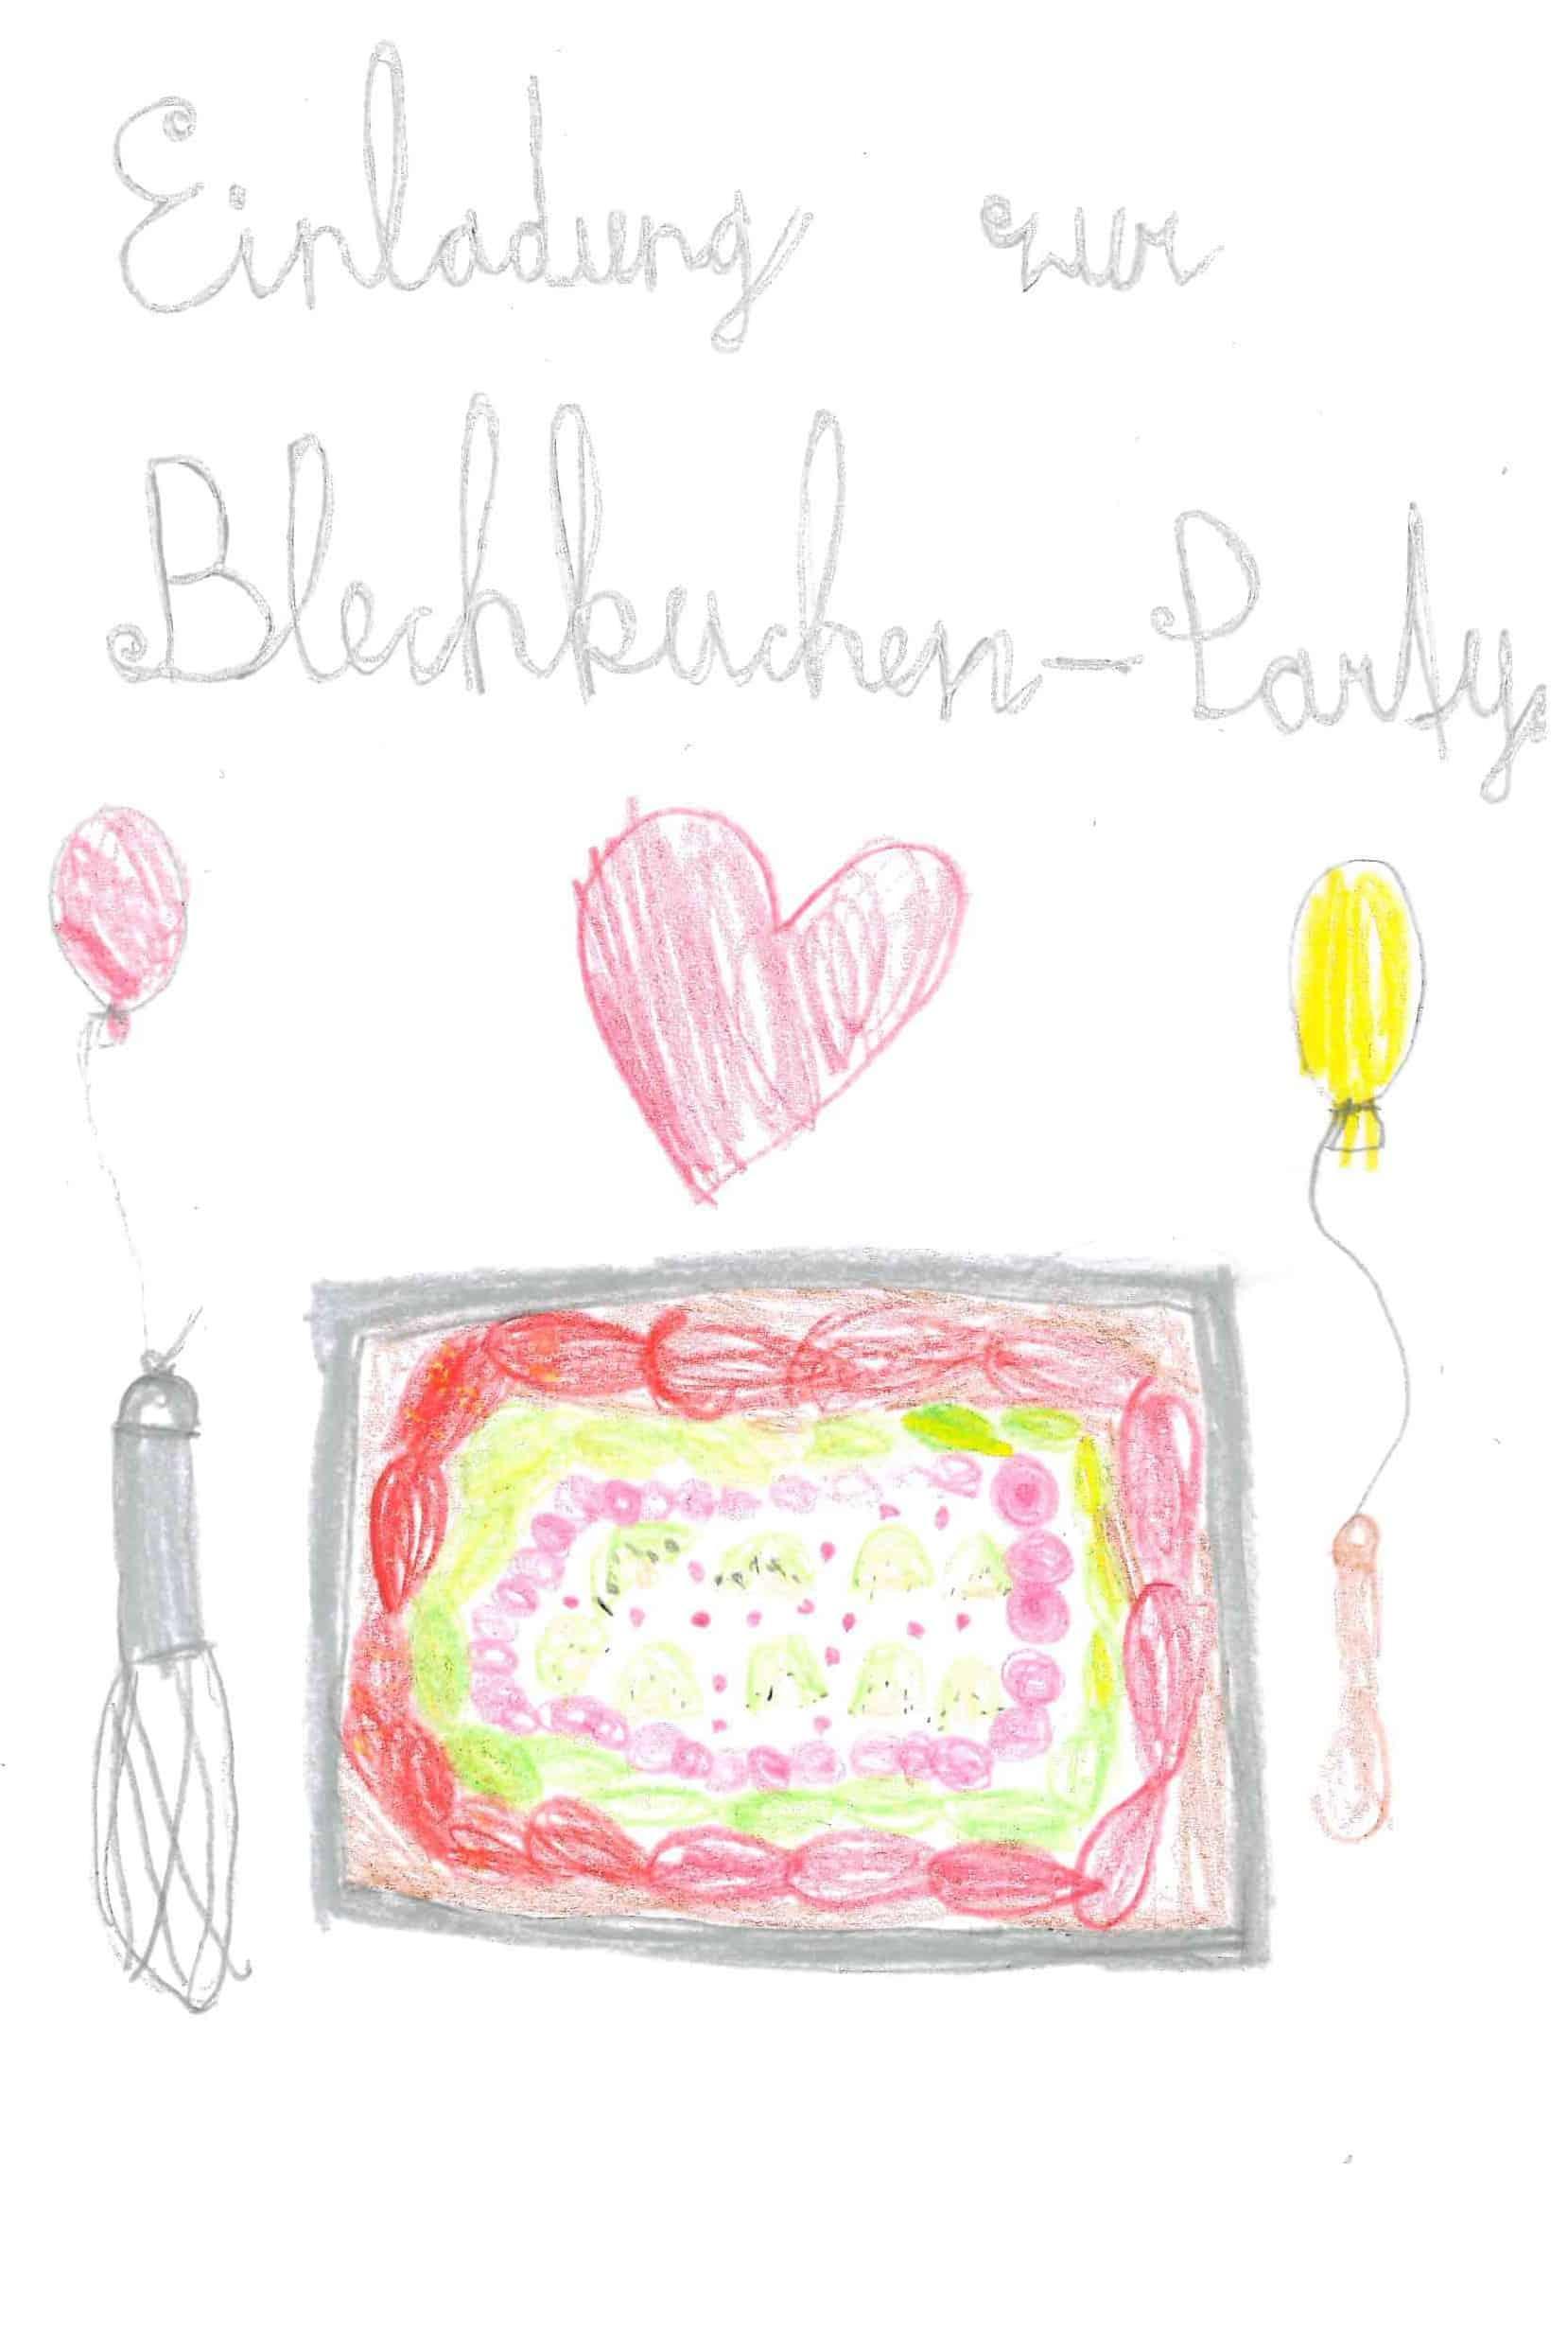 blechkuchen-party